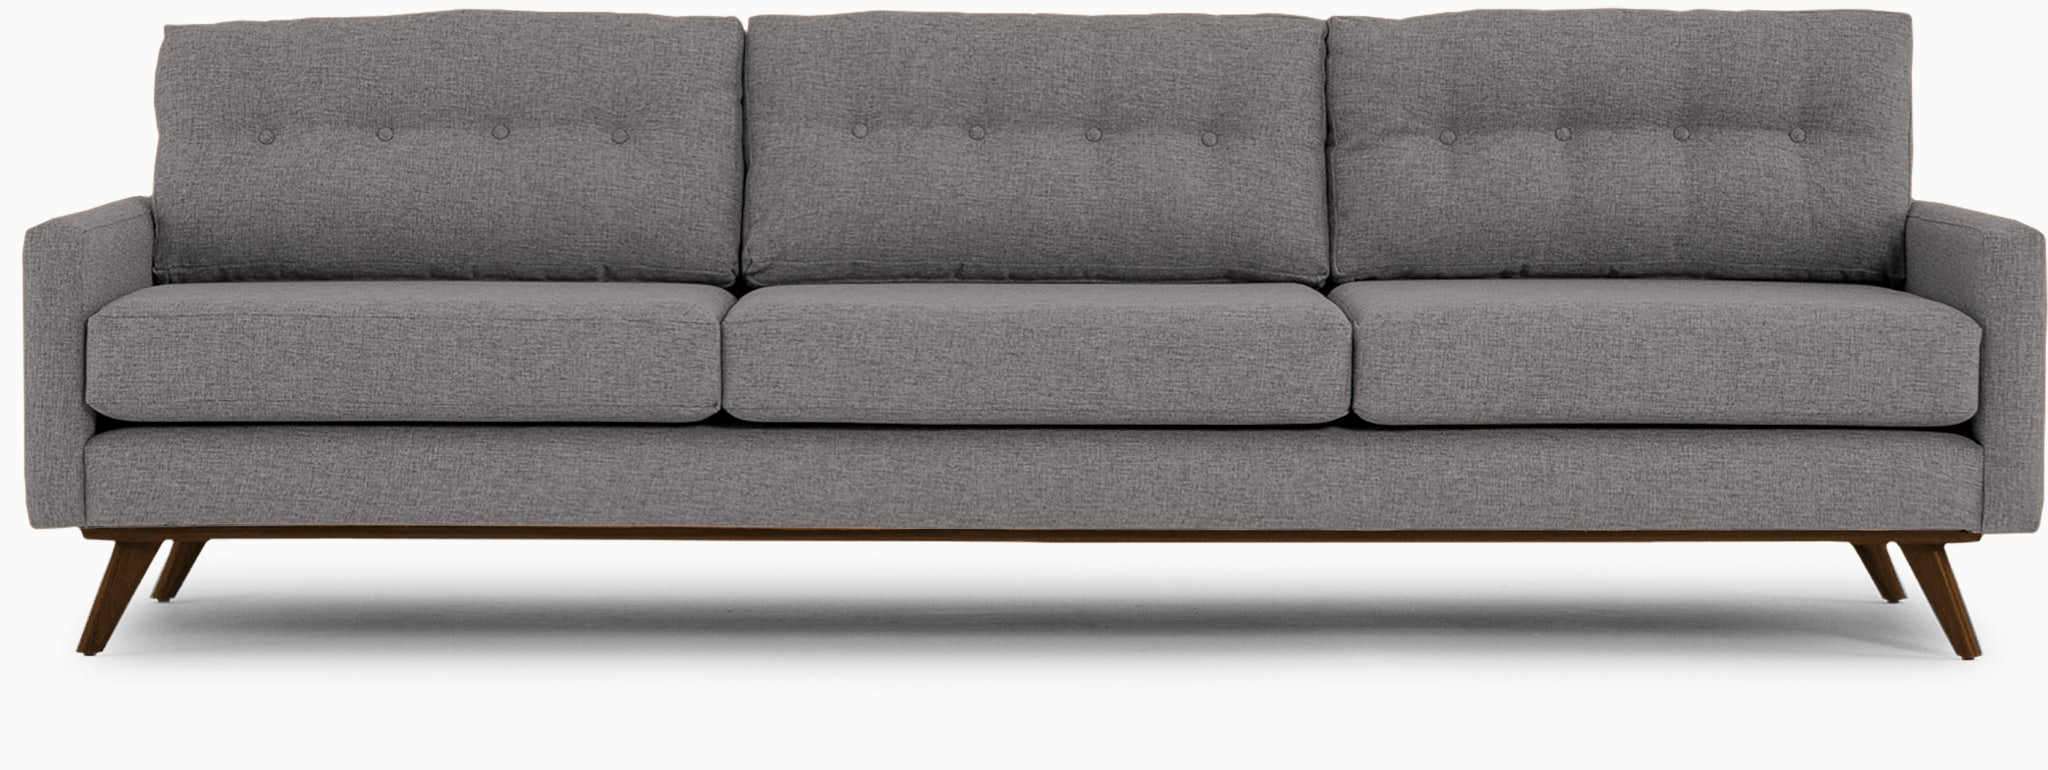 hopson grand sofa taylor felt grey